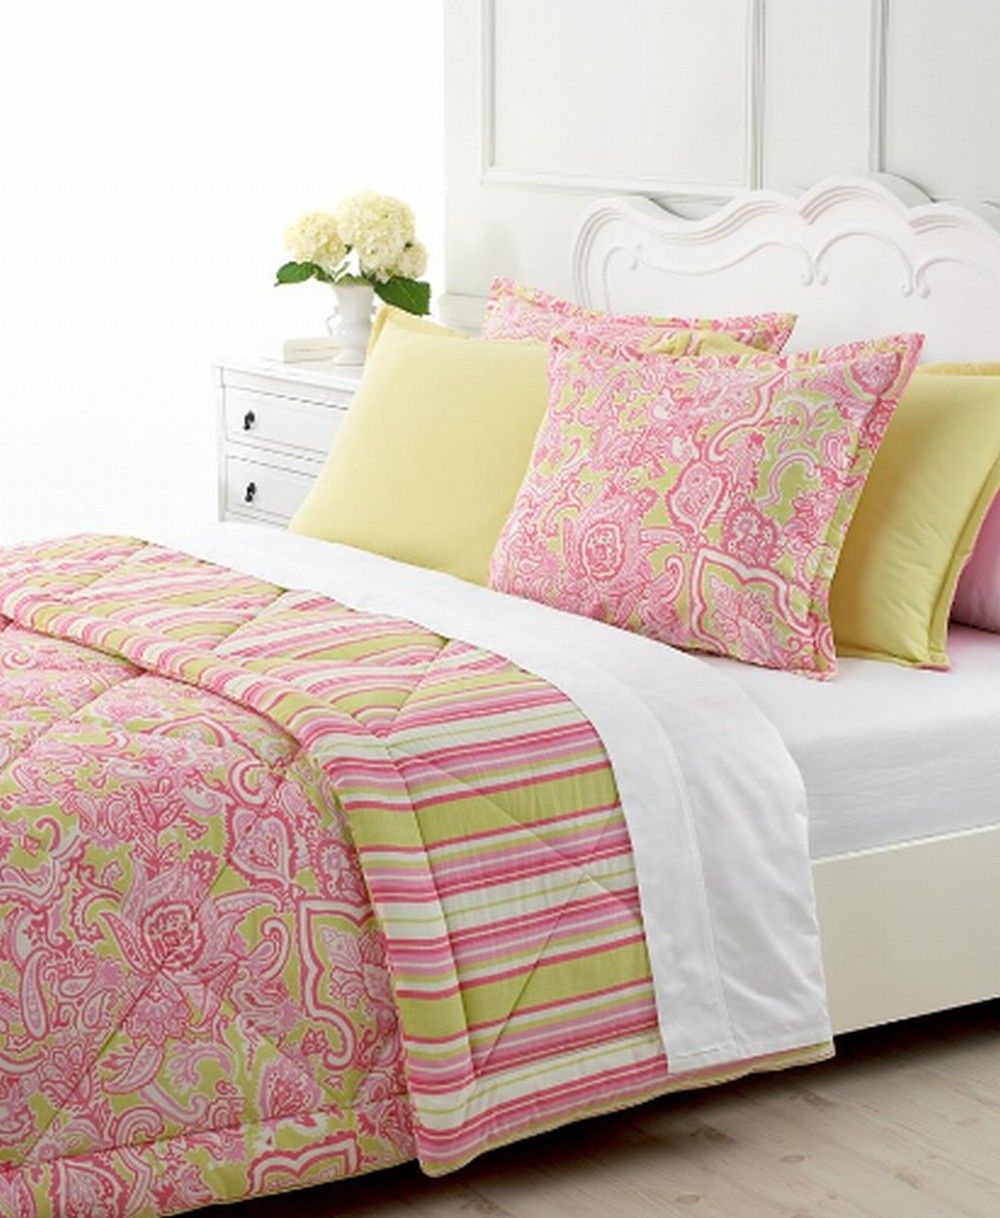 green dp queen home amazon kannapali piece kitchen set park yellow madison comforter com